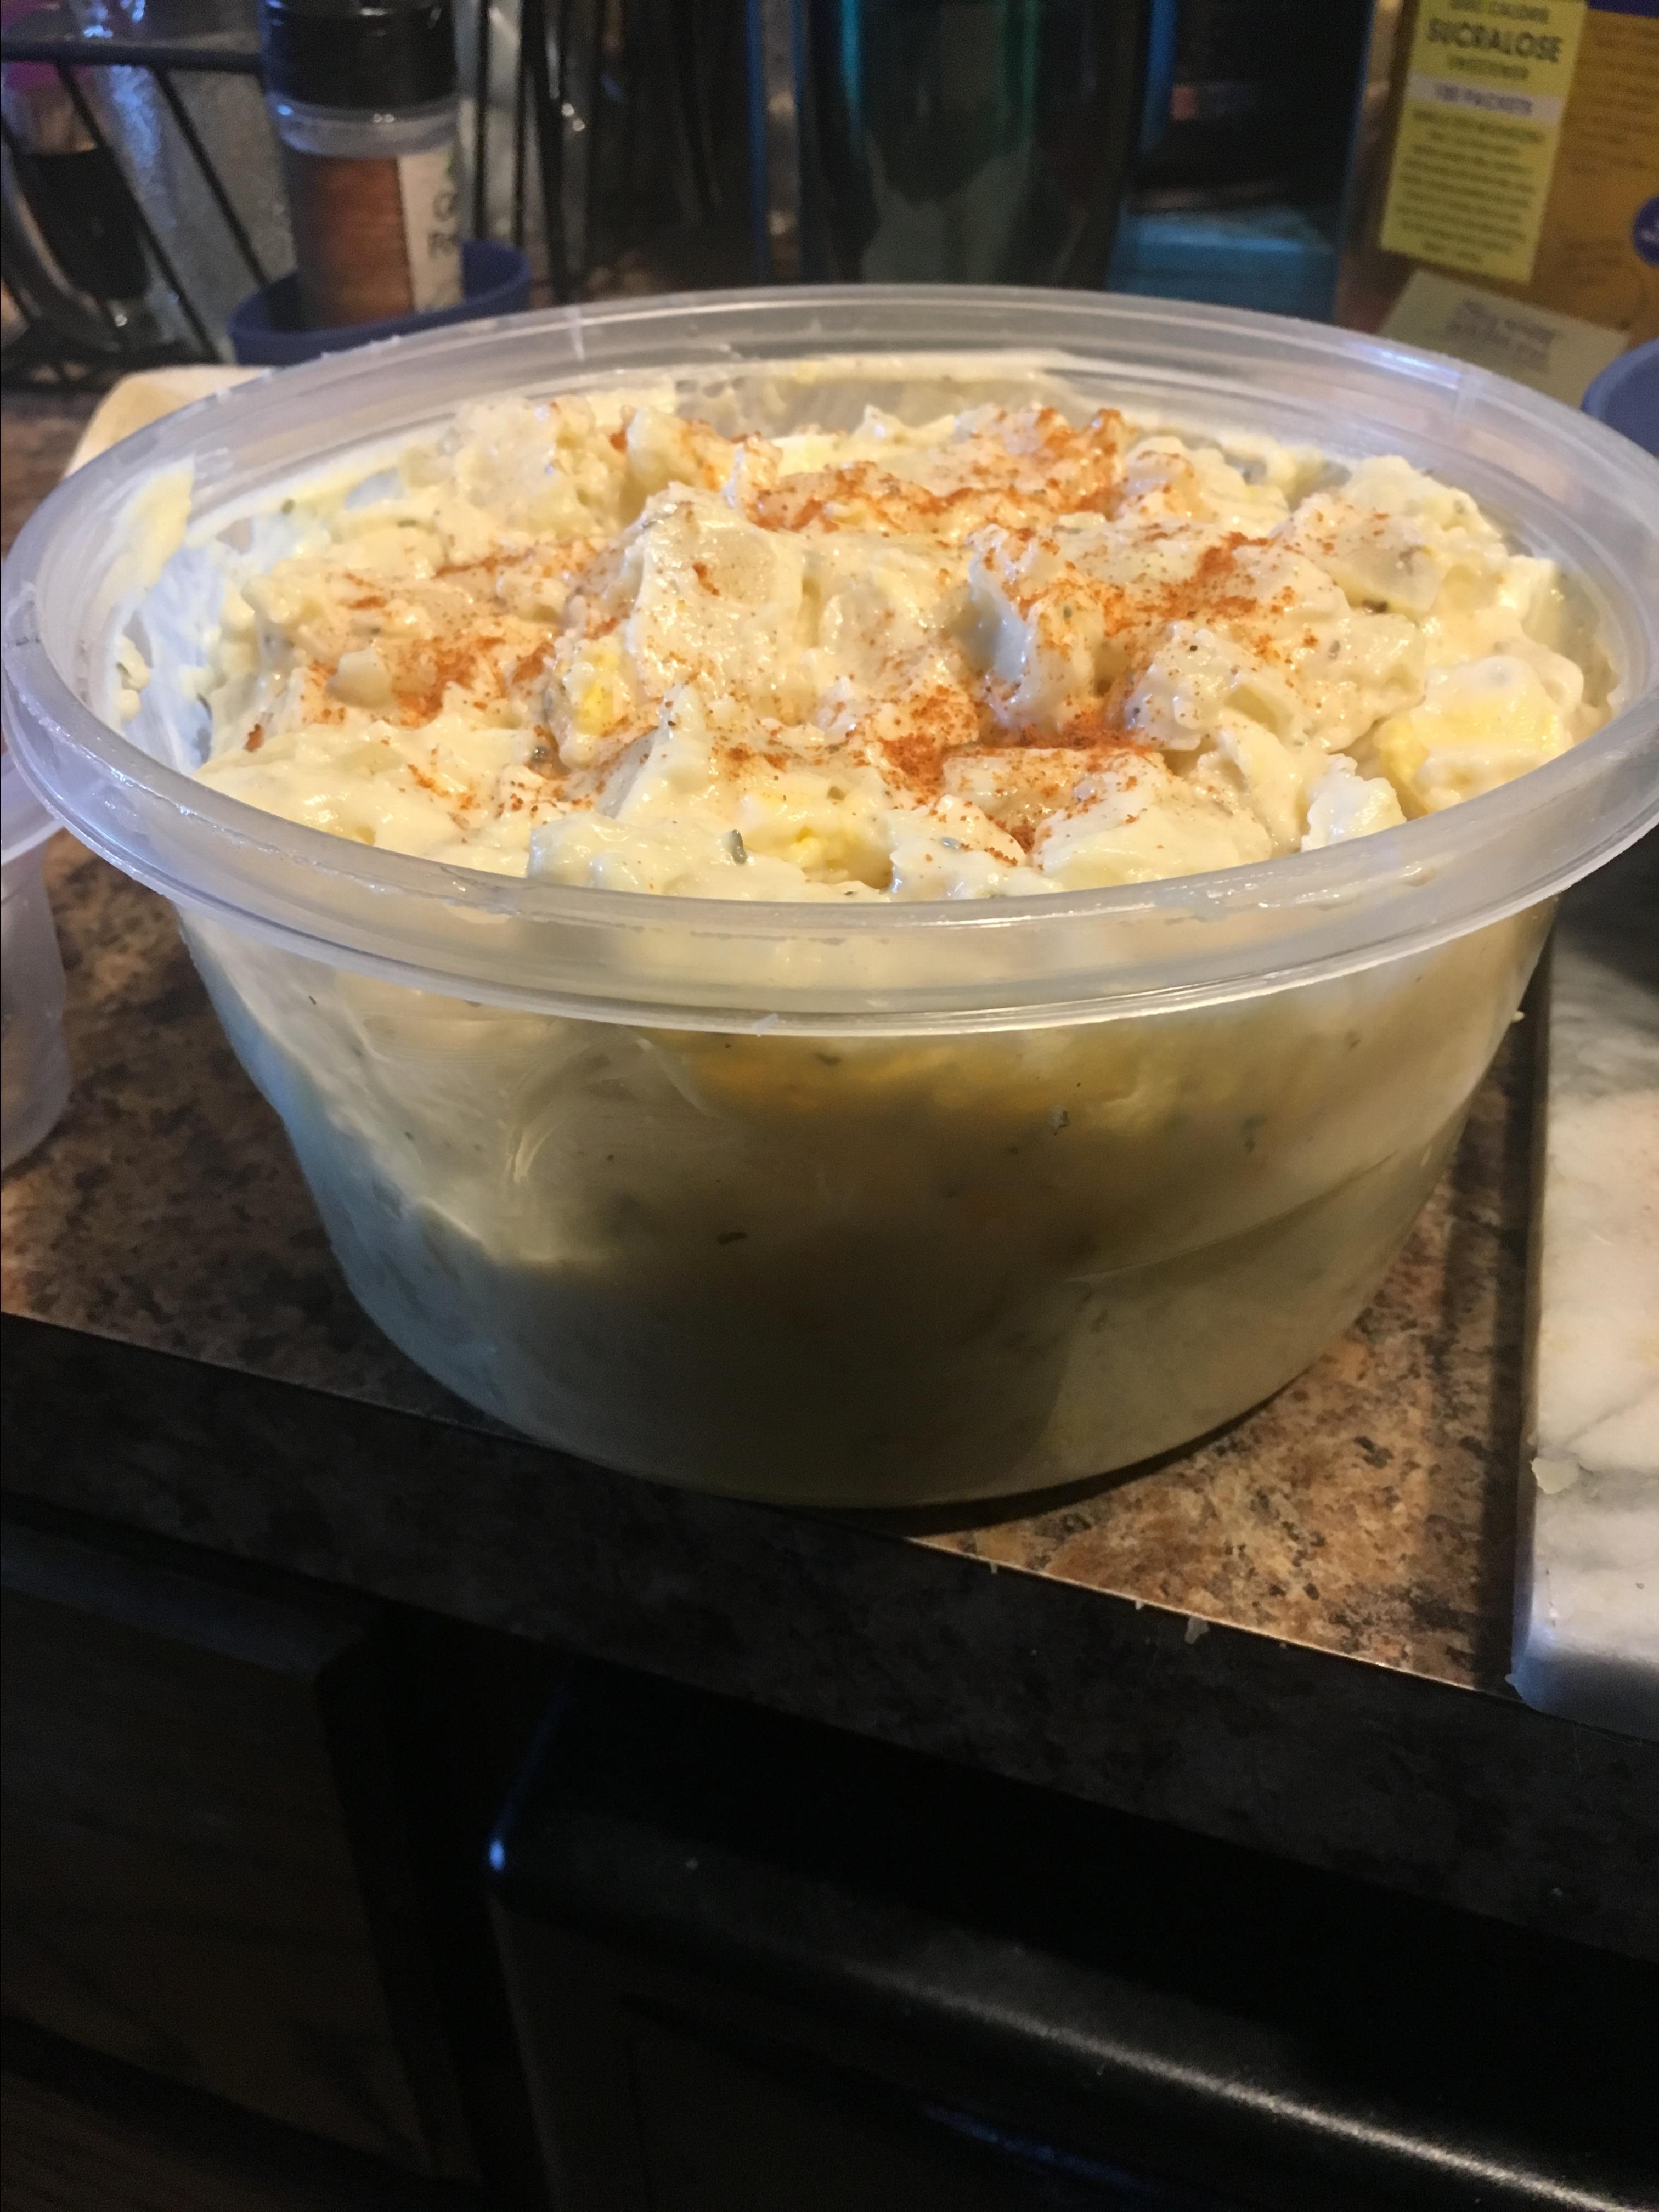 Creamy, Lemony Potato Salad